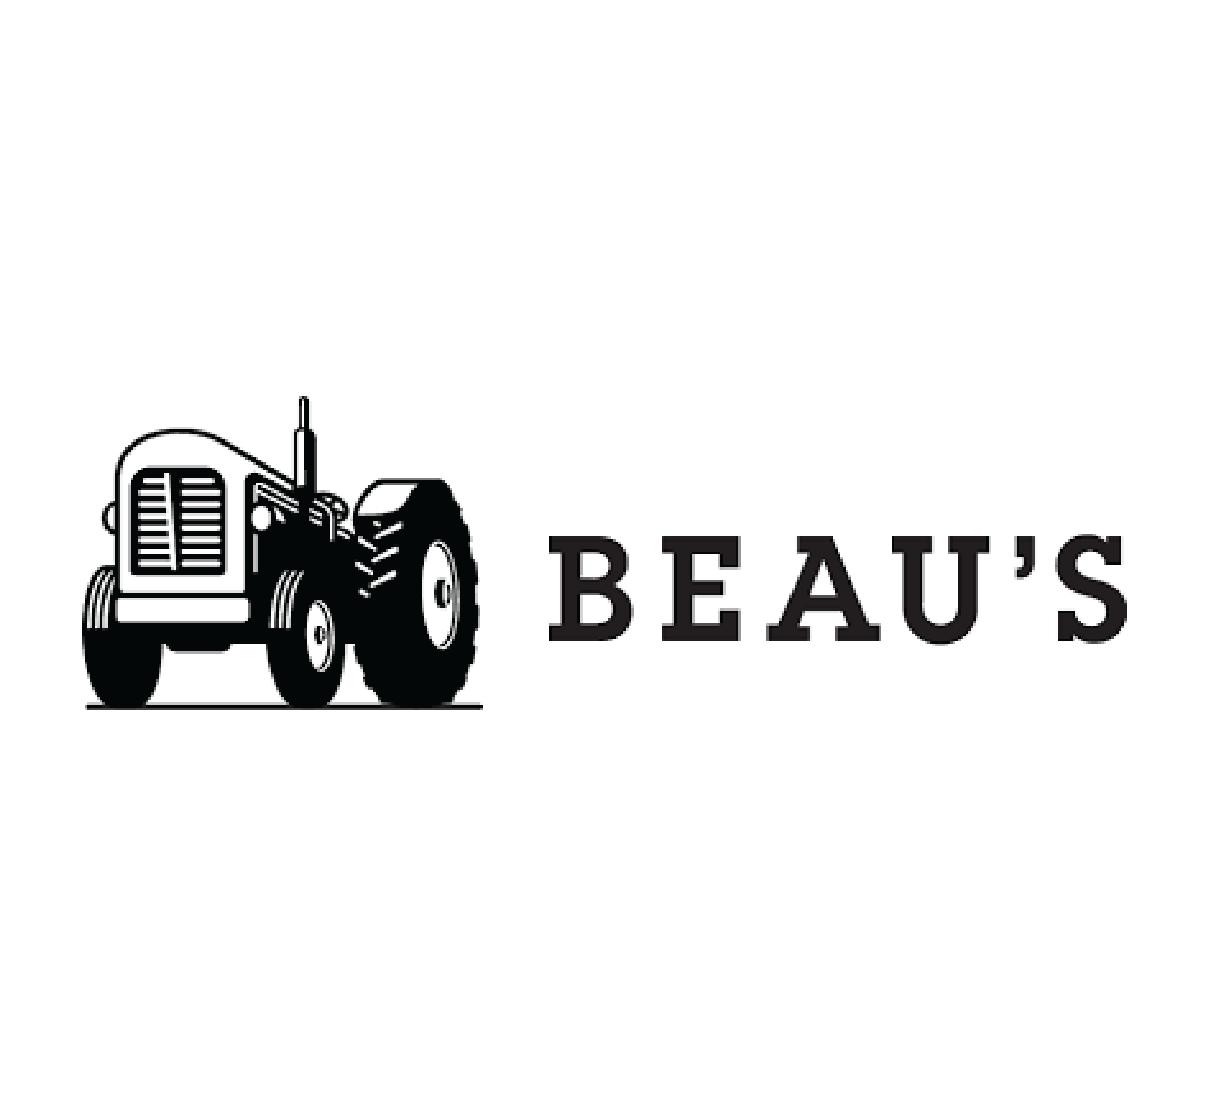 Beaus-01.png